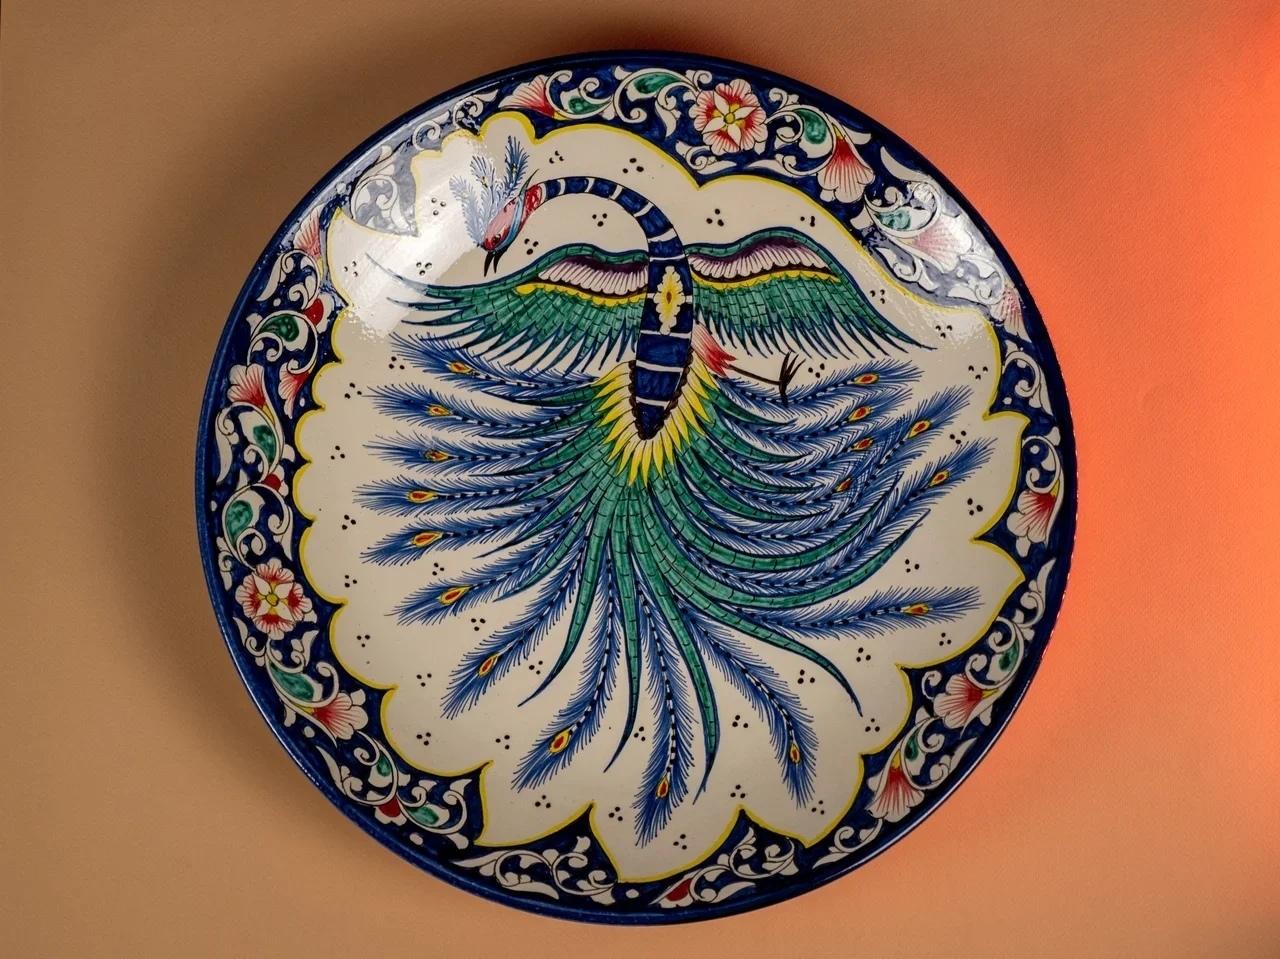 Посуда Ляган ручная роспись павлин 42 см PlZHuF9Ev2M.jpg